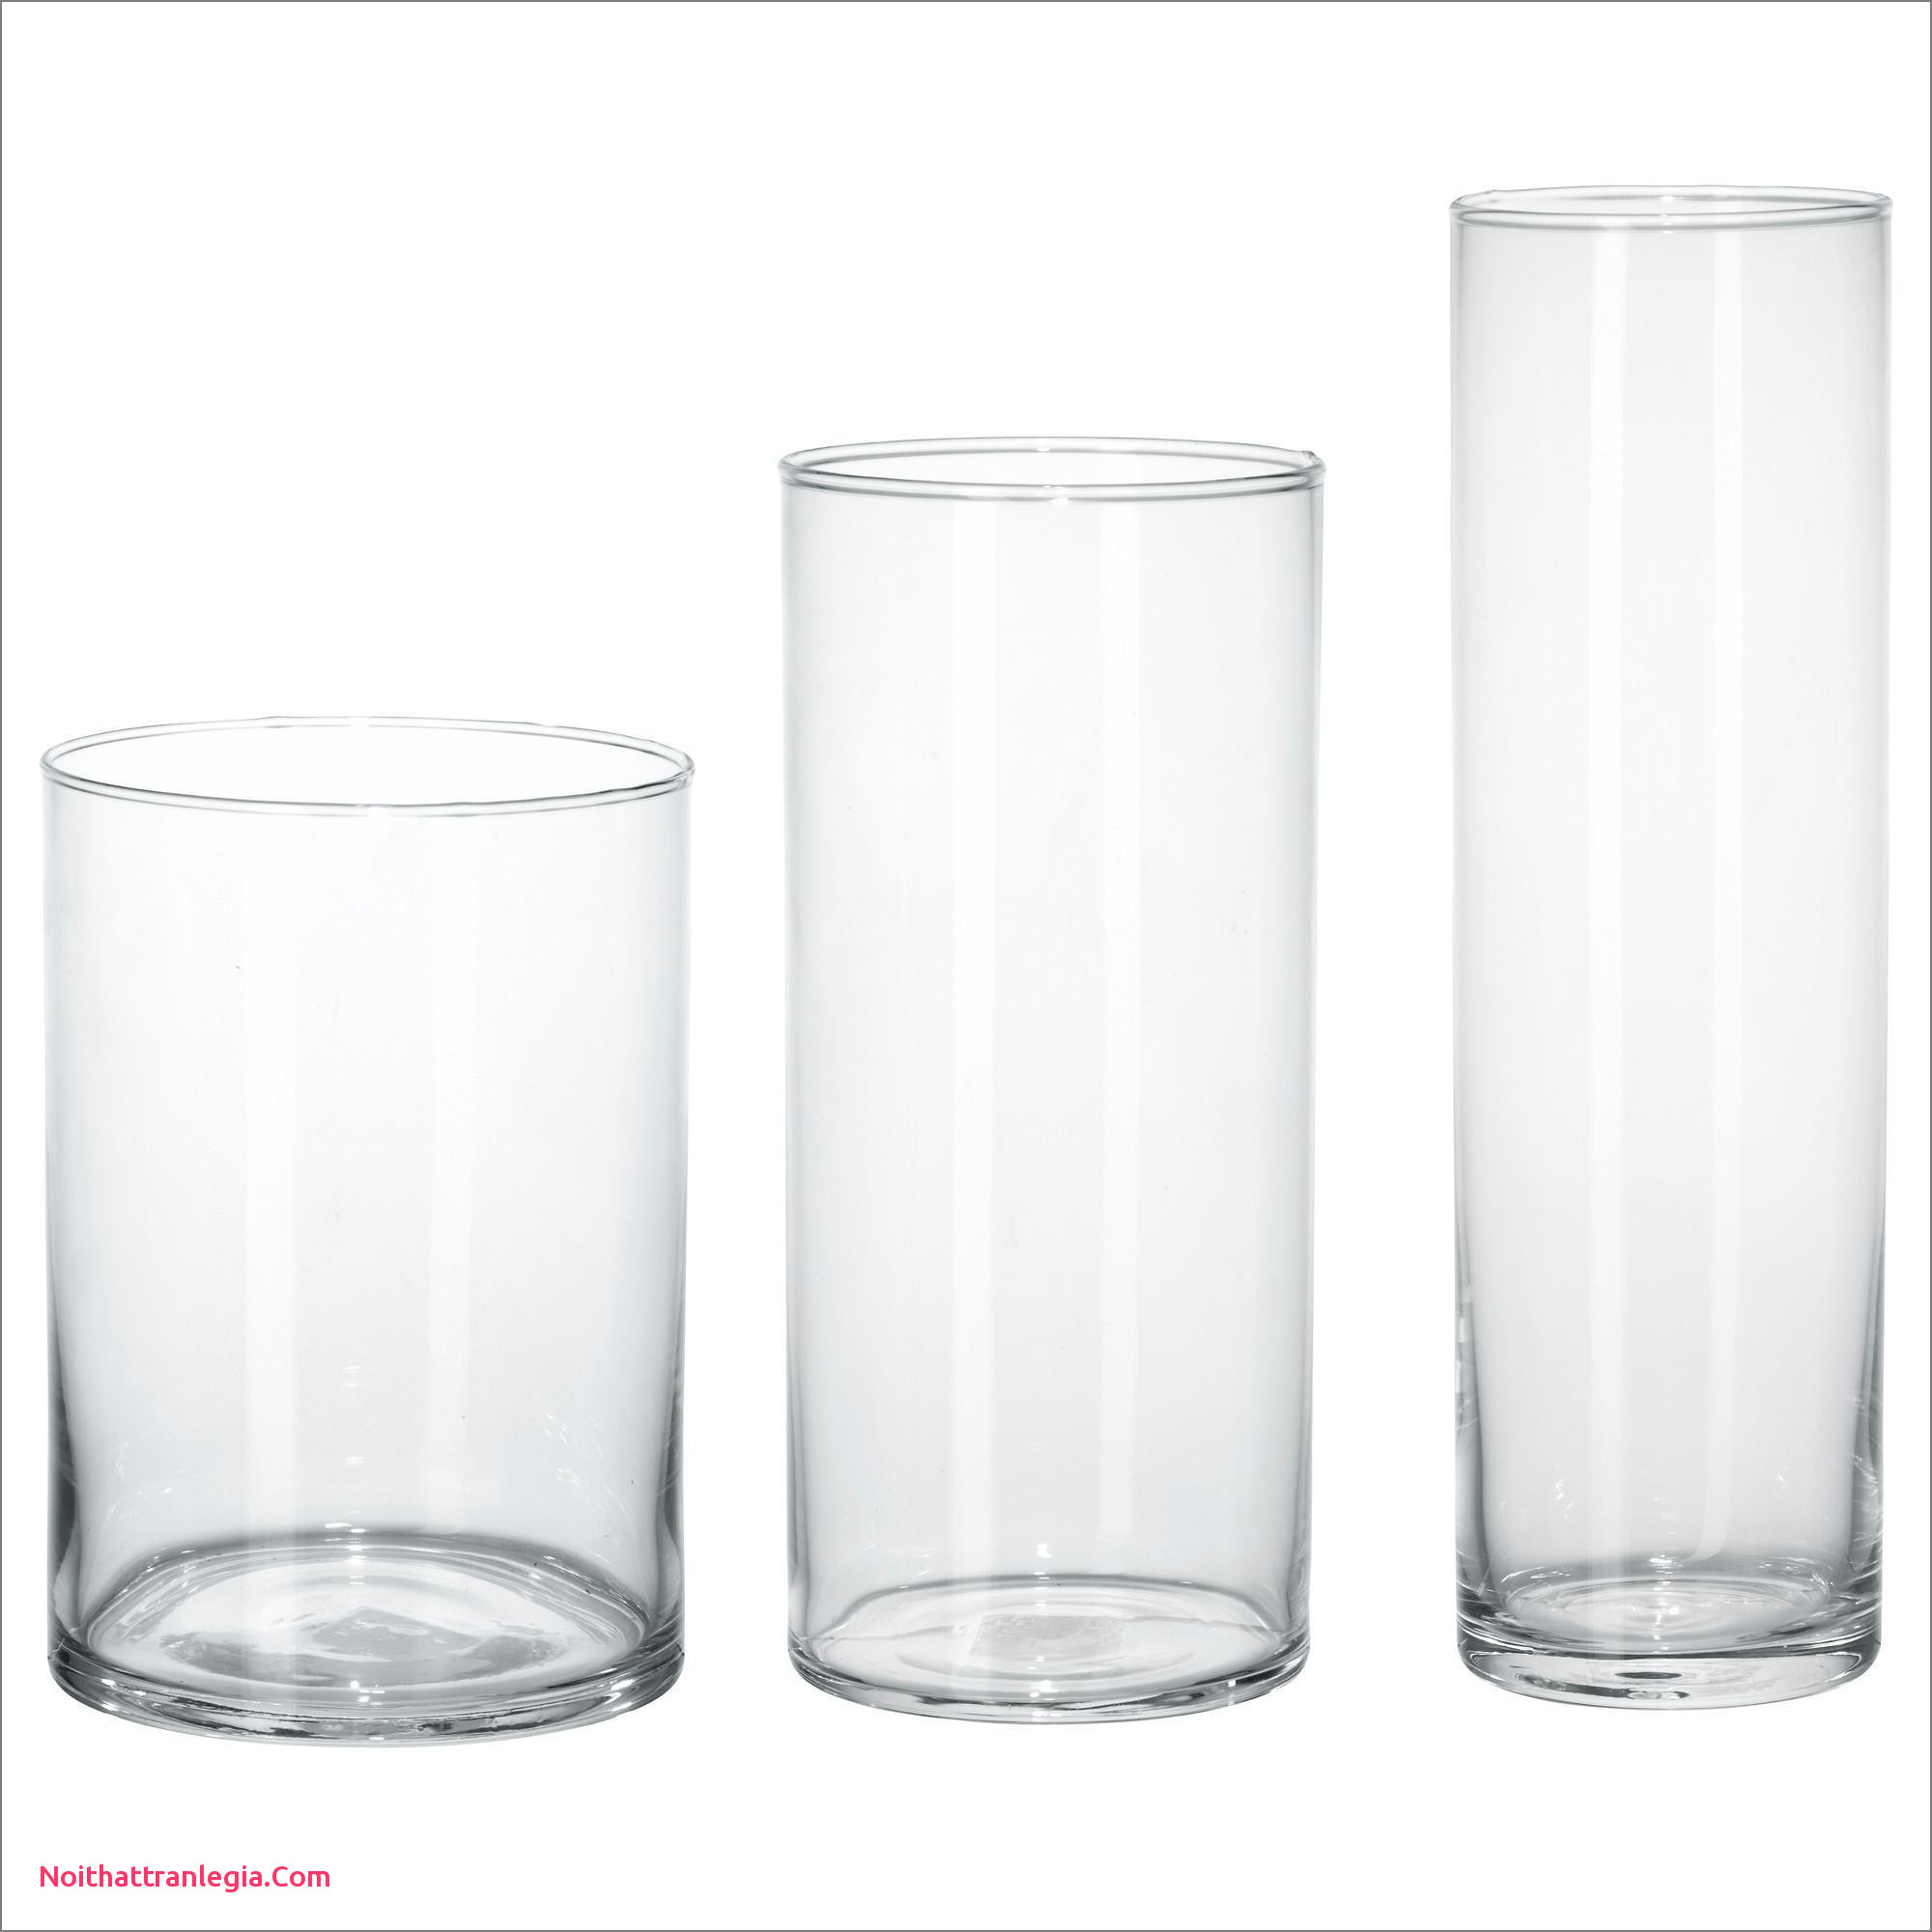 Plastic Silver Vases Of 20 Large Floor Vase Nz Noithattranlegia Vases Design Regarding Home Design Elegant Floor Vase Ikea Floor Vase Ikea Fresh Badregal Ikea Inspirierend Living Room